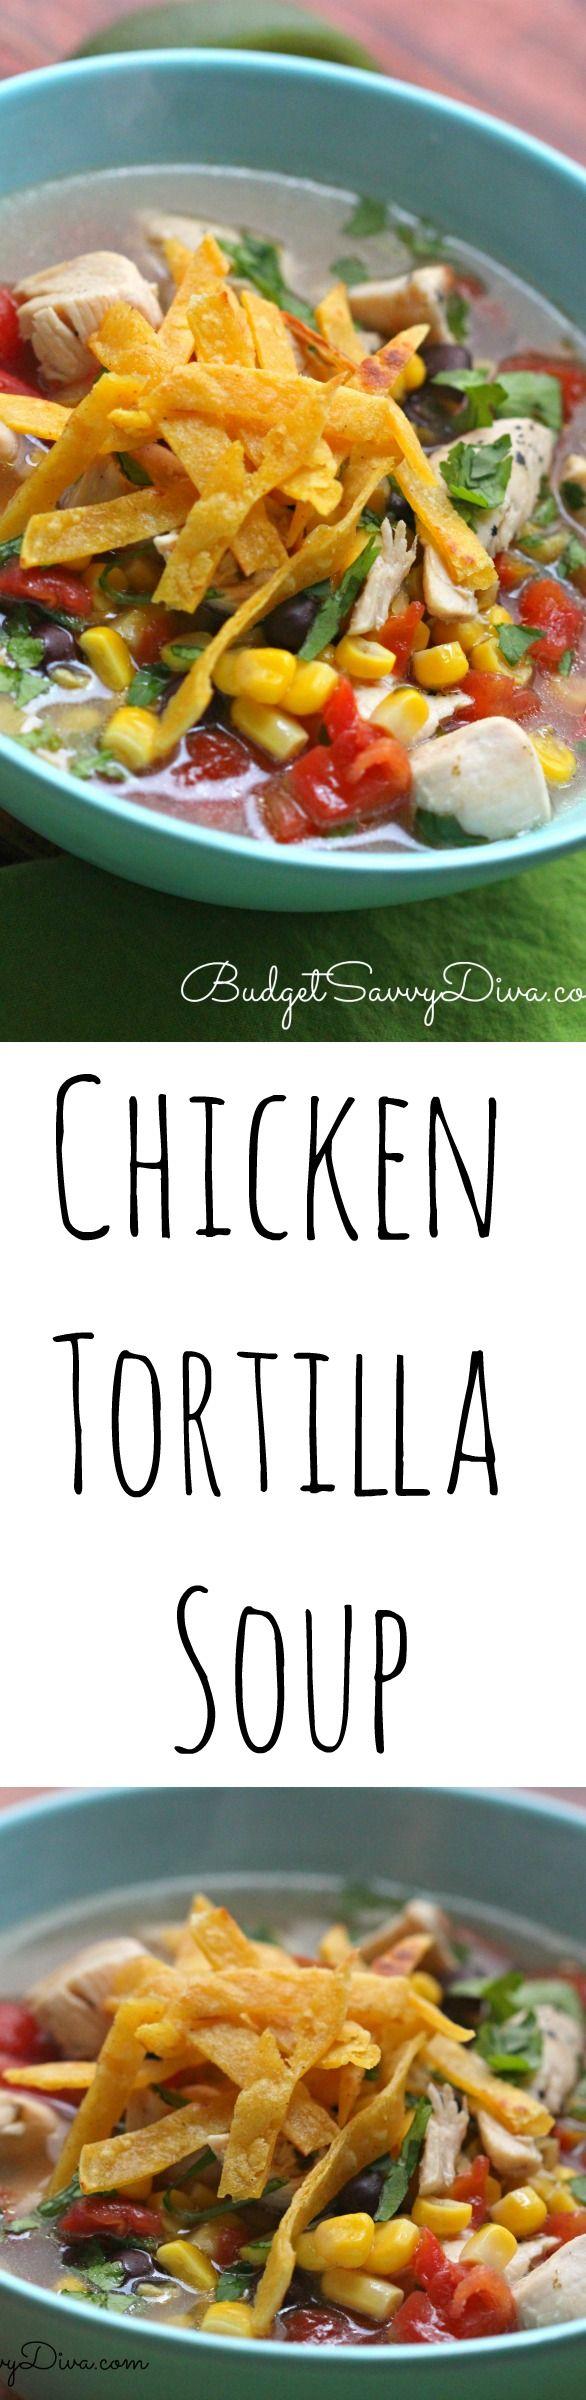 Chicken Tortilla Soup Recipe - BEST recipe EVER!